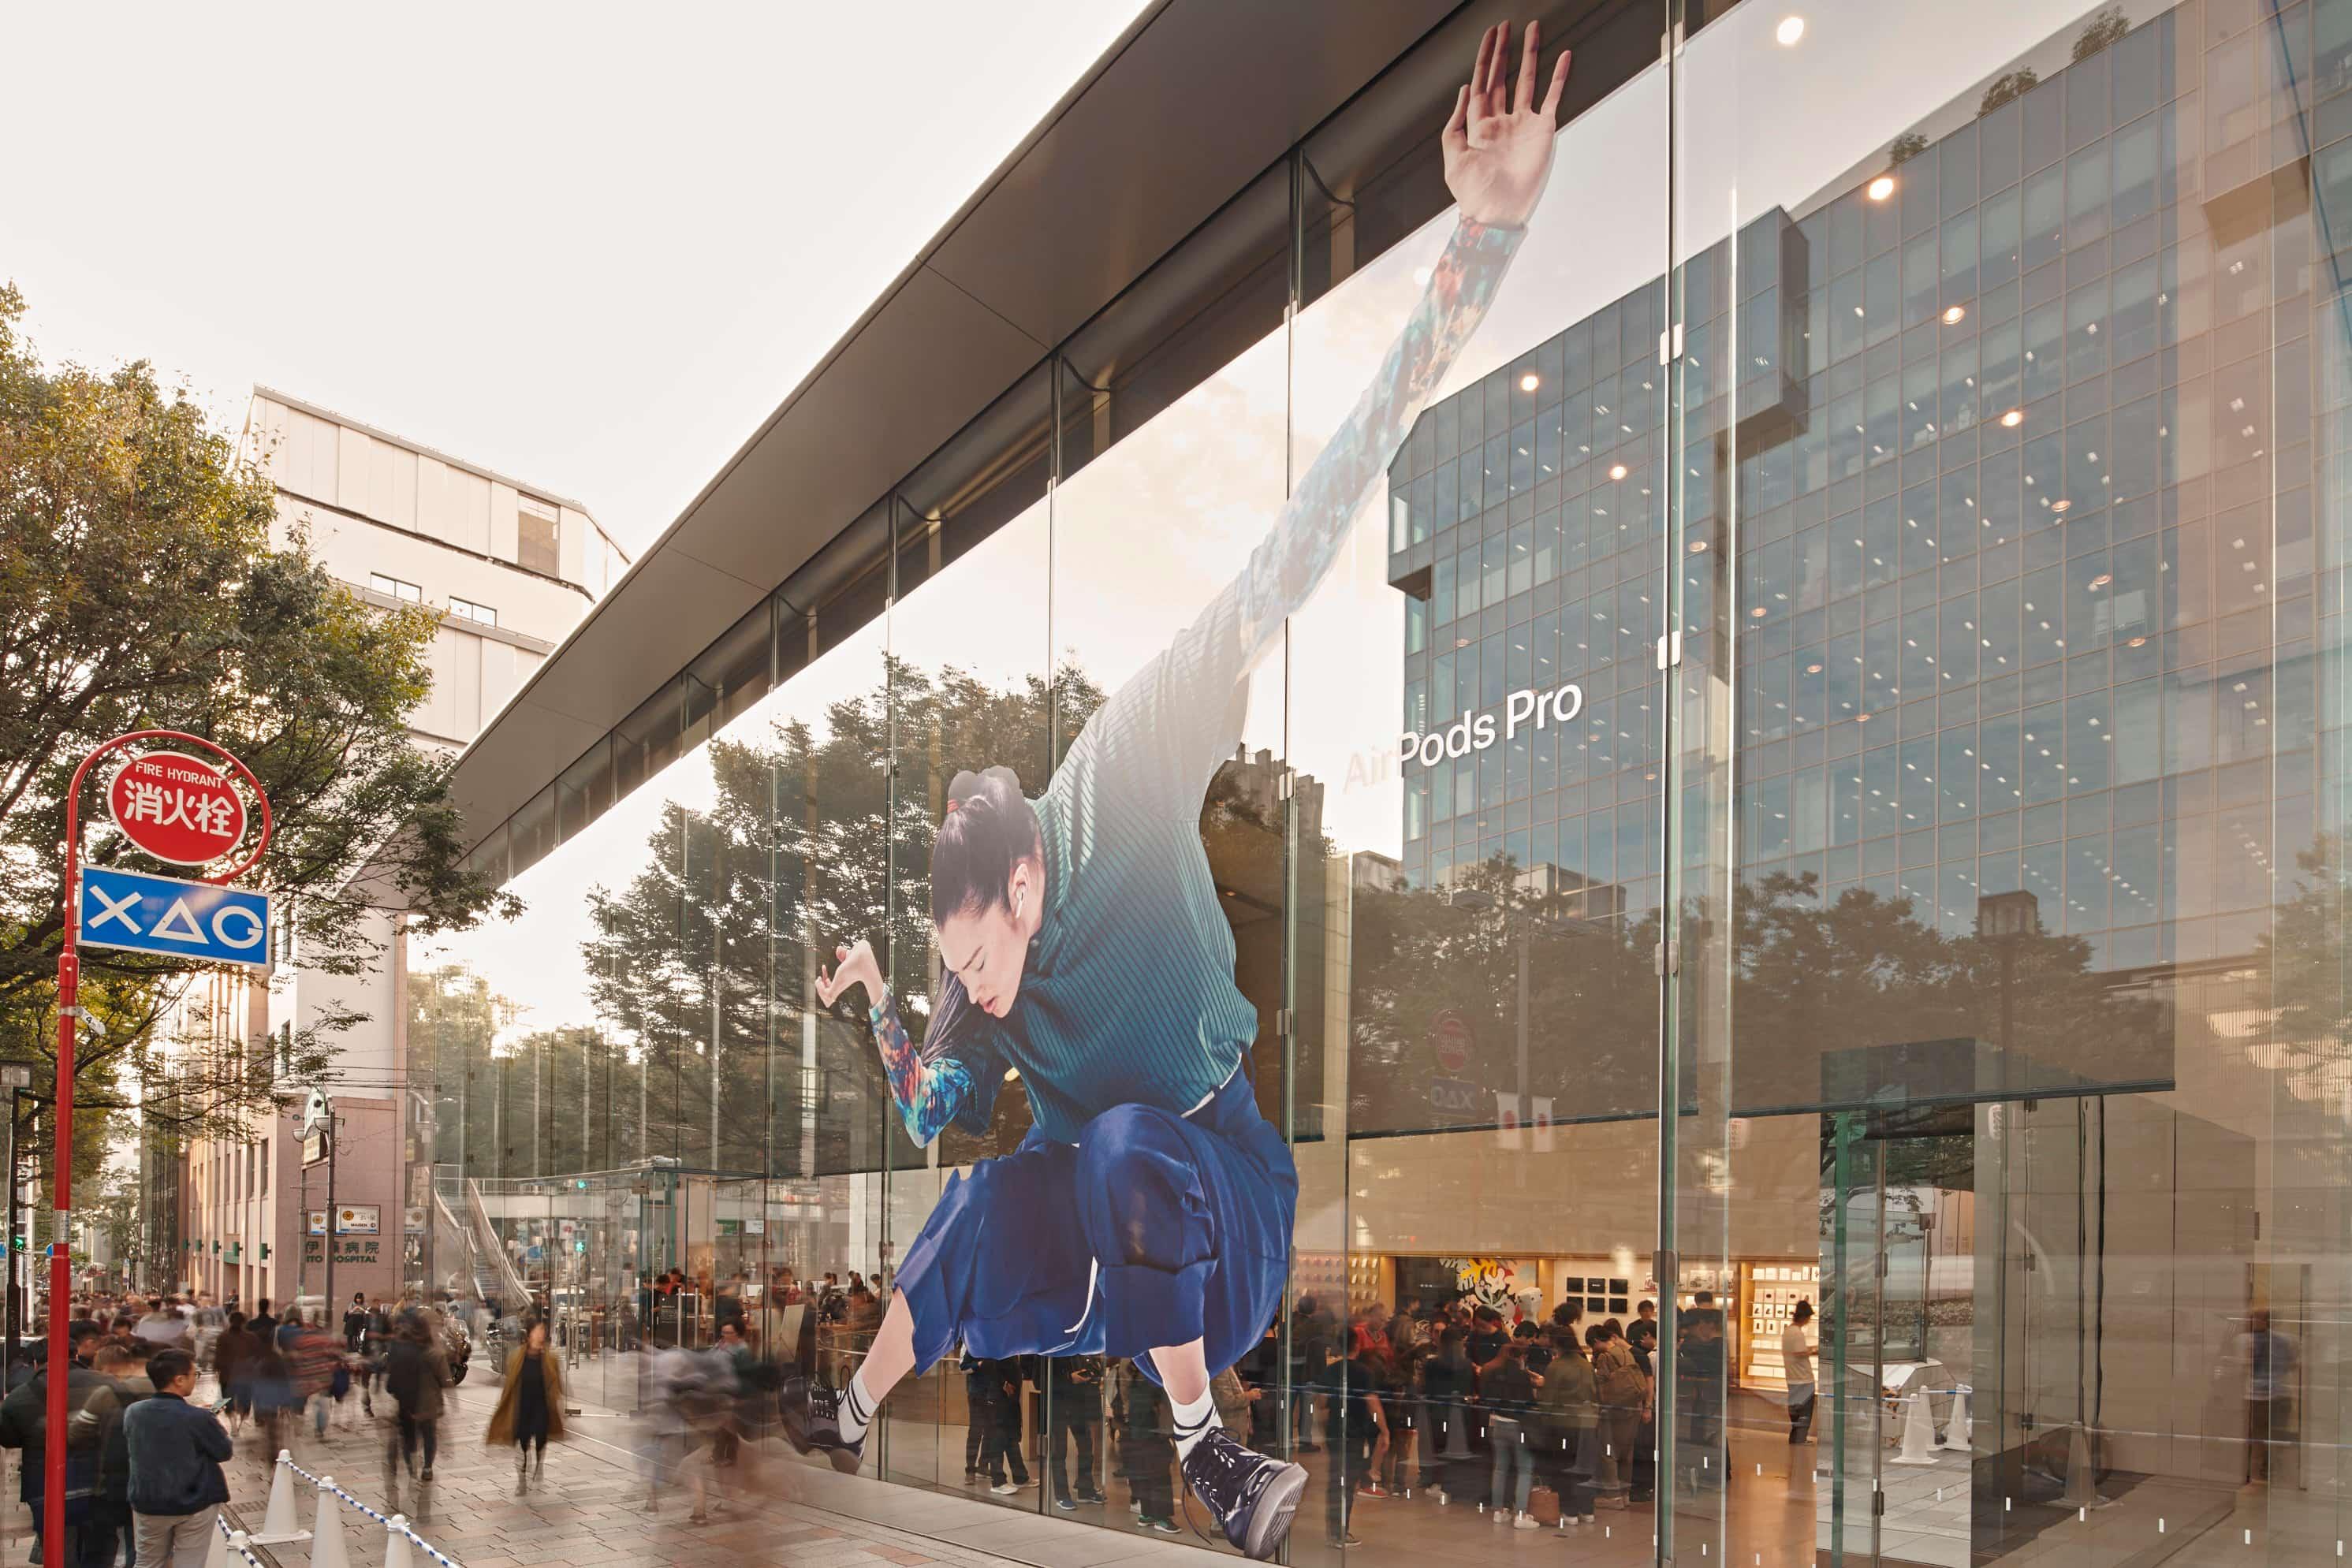 Apple Airpod Pro Launch Tokyo Window Graphic 10302019